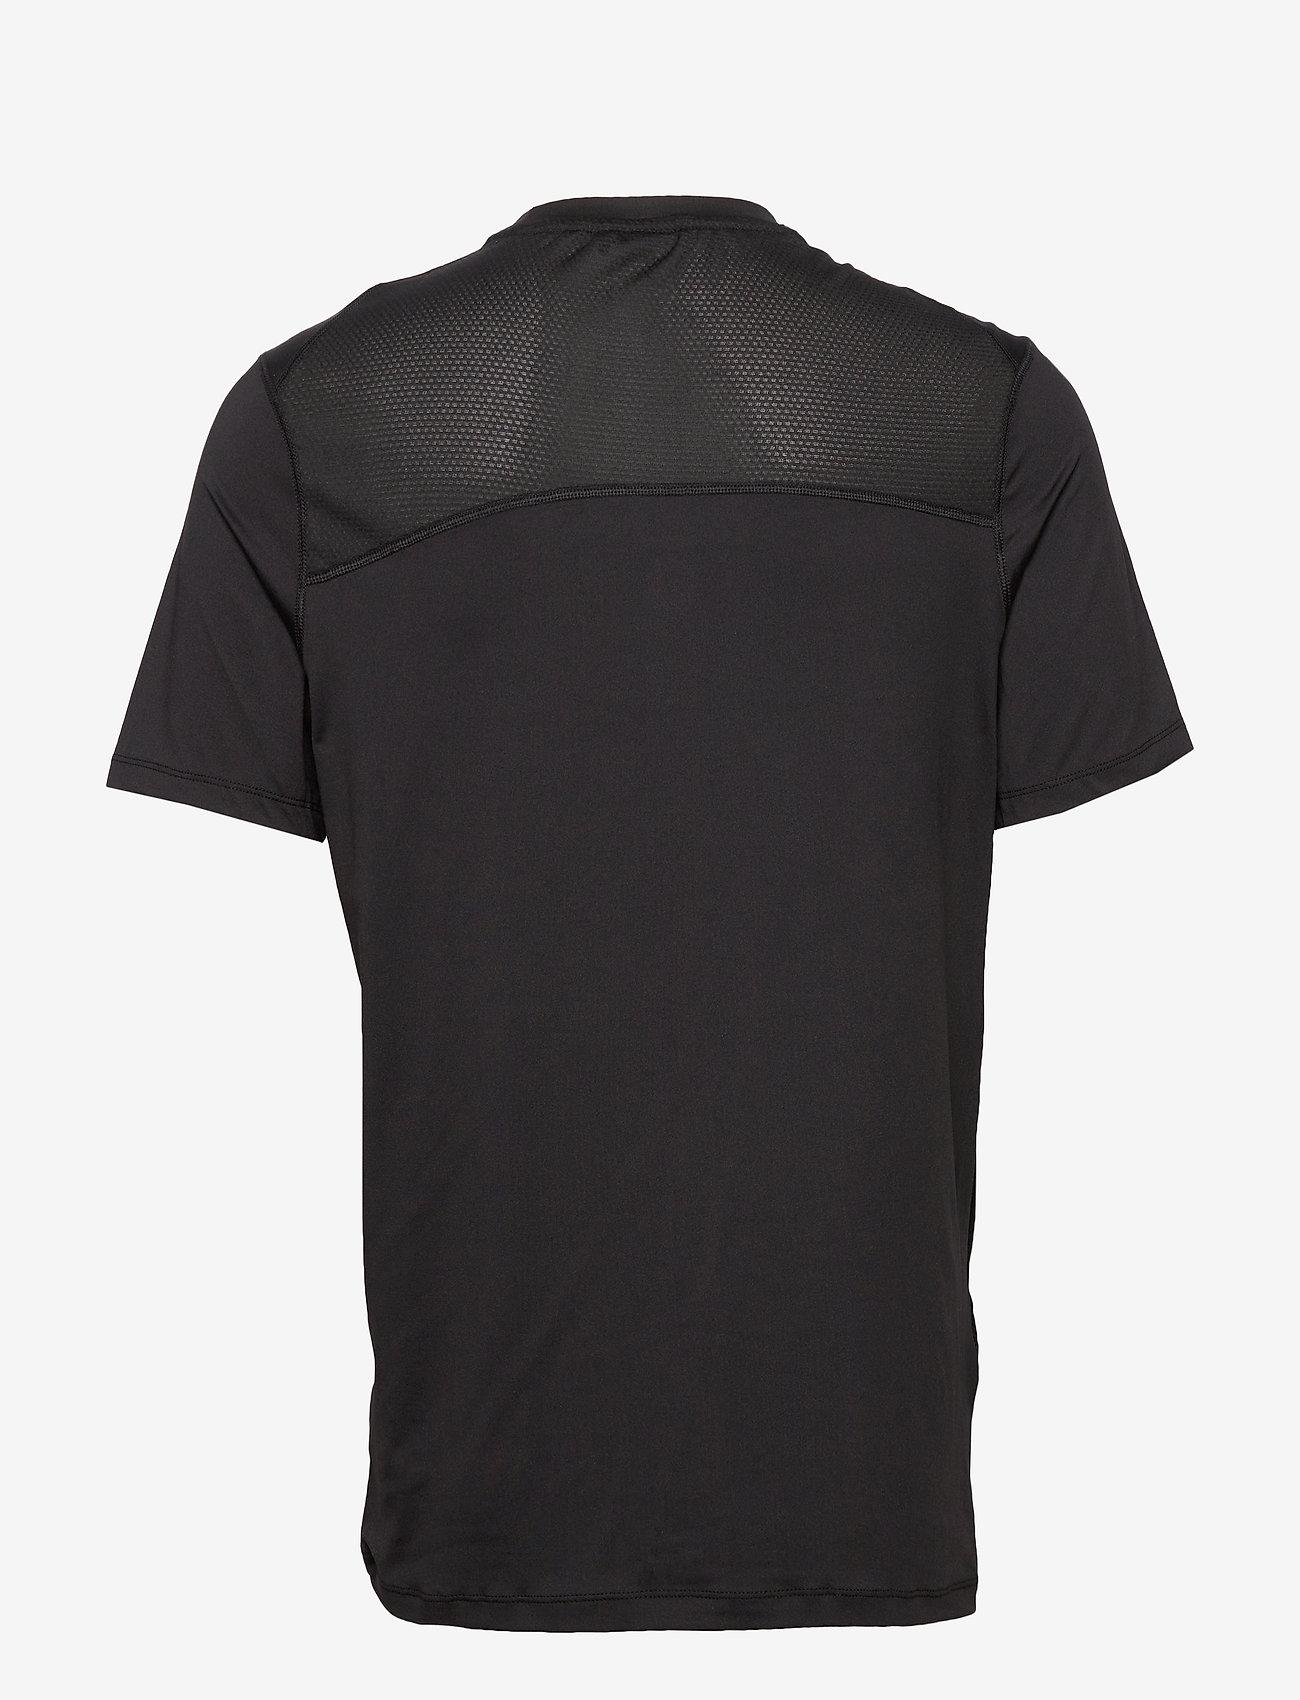 Craft ADV ESSENCE SS TEE M - T-skjorter BLACK - Menn Klær